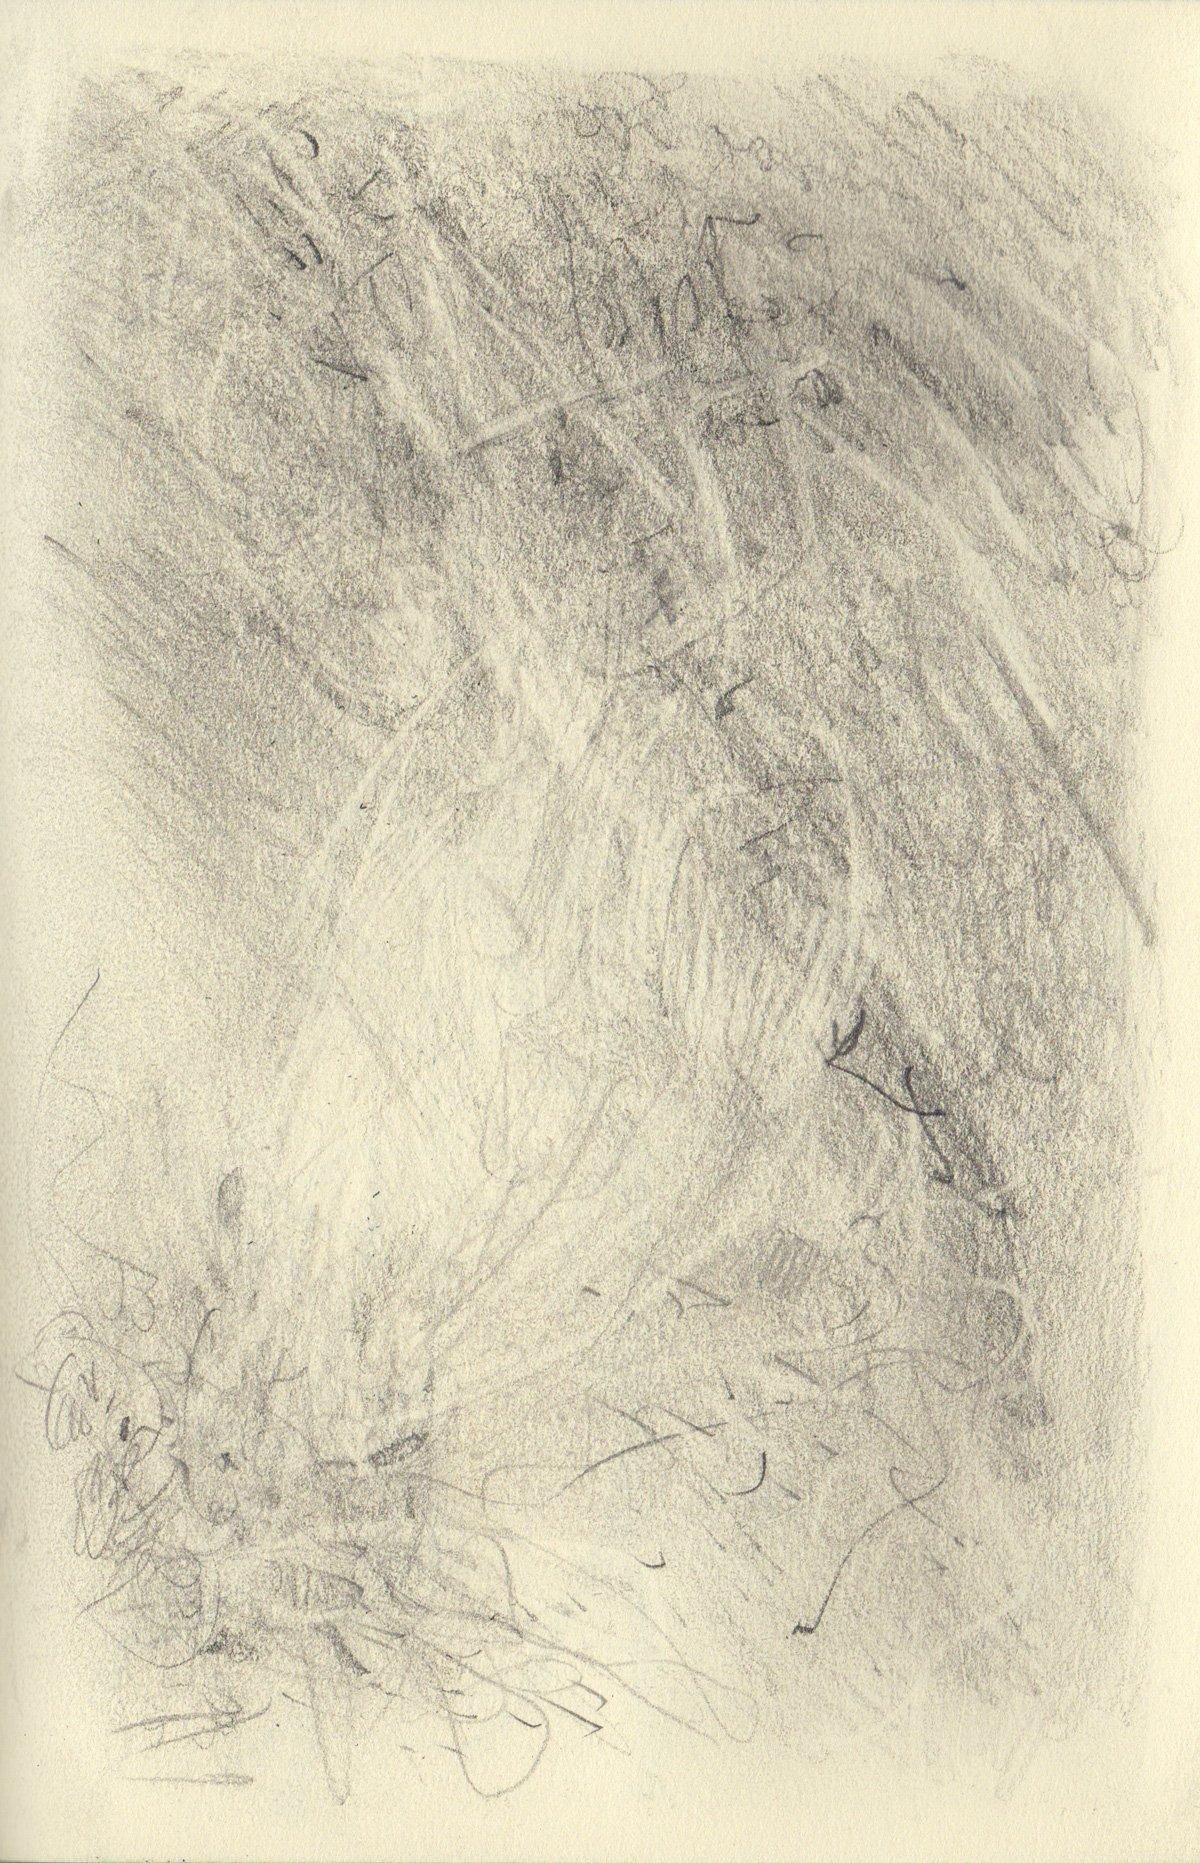 "GAH 5.5 x 8.25"" 2020 Pencil on Sketchbook Pages"